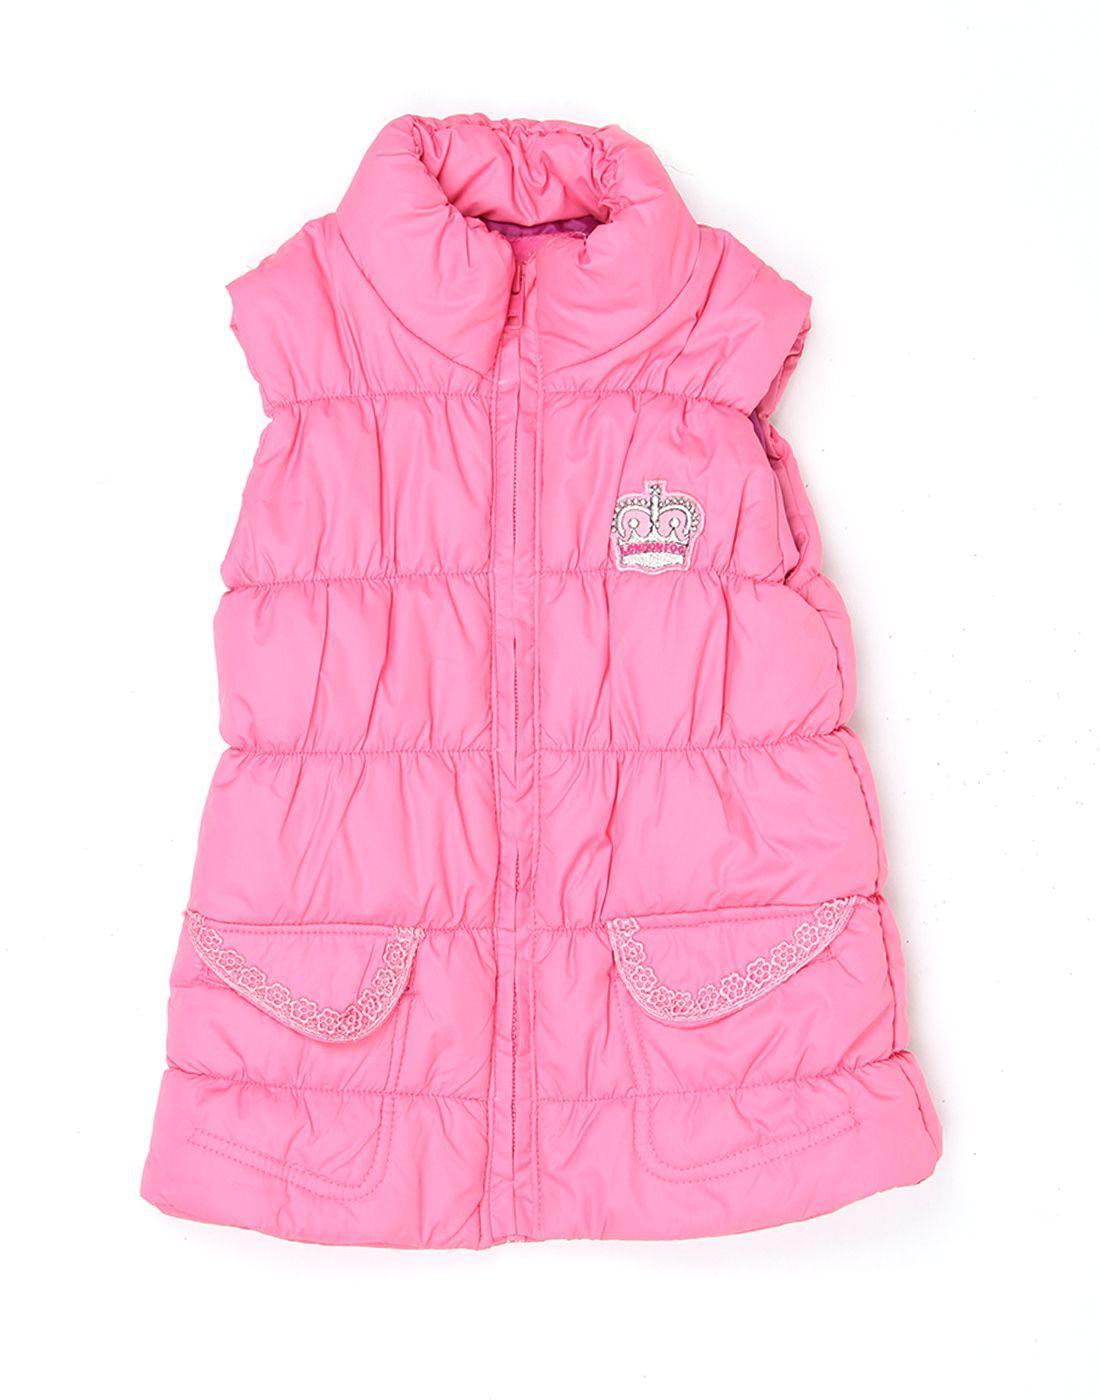 London Fog Girls Pink Sleeveless Jacket